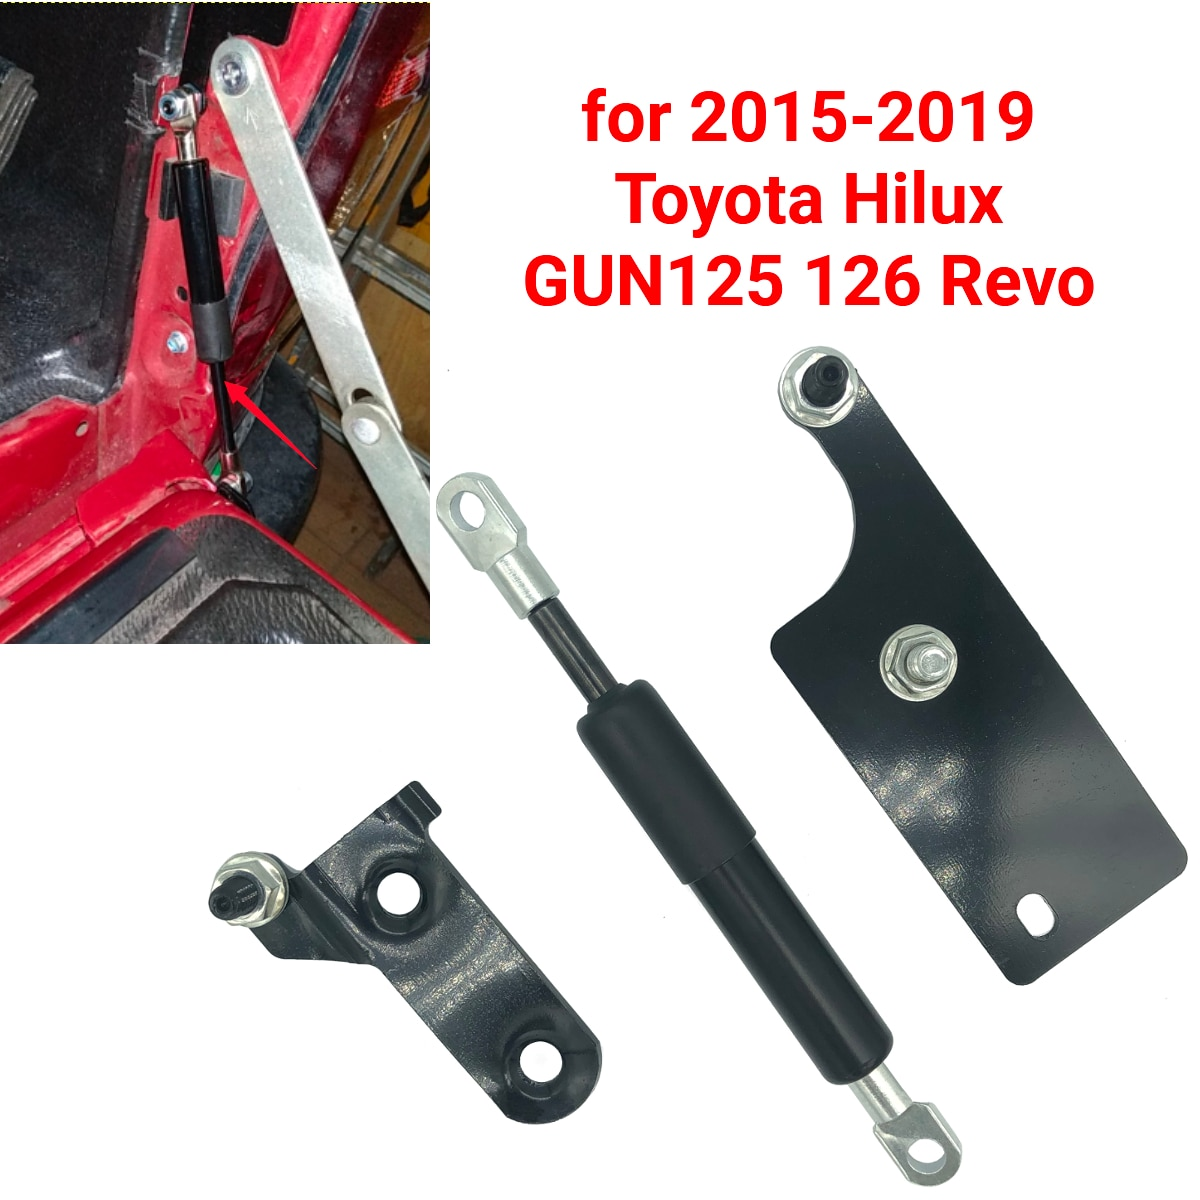 Porta traseira do carro lento para baixo suporte haste elevador strut barra amortecedor de choque gás para toyota hilux gun125 revo 2015 2016 2017 2018 2019